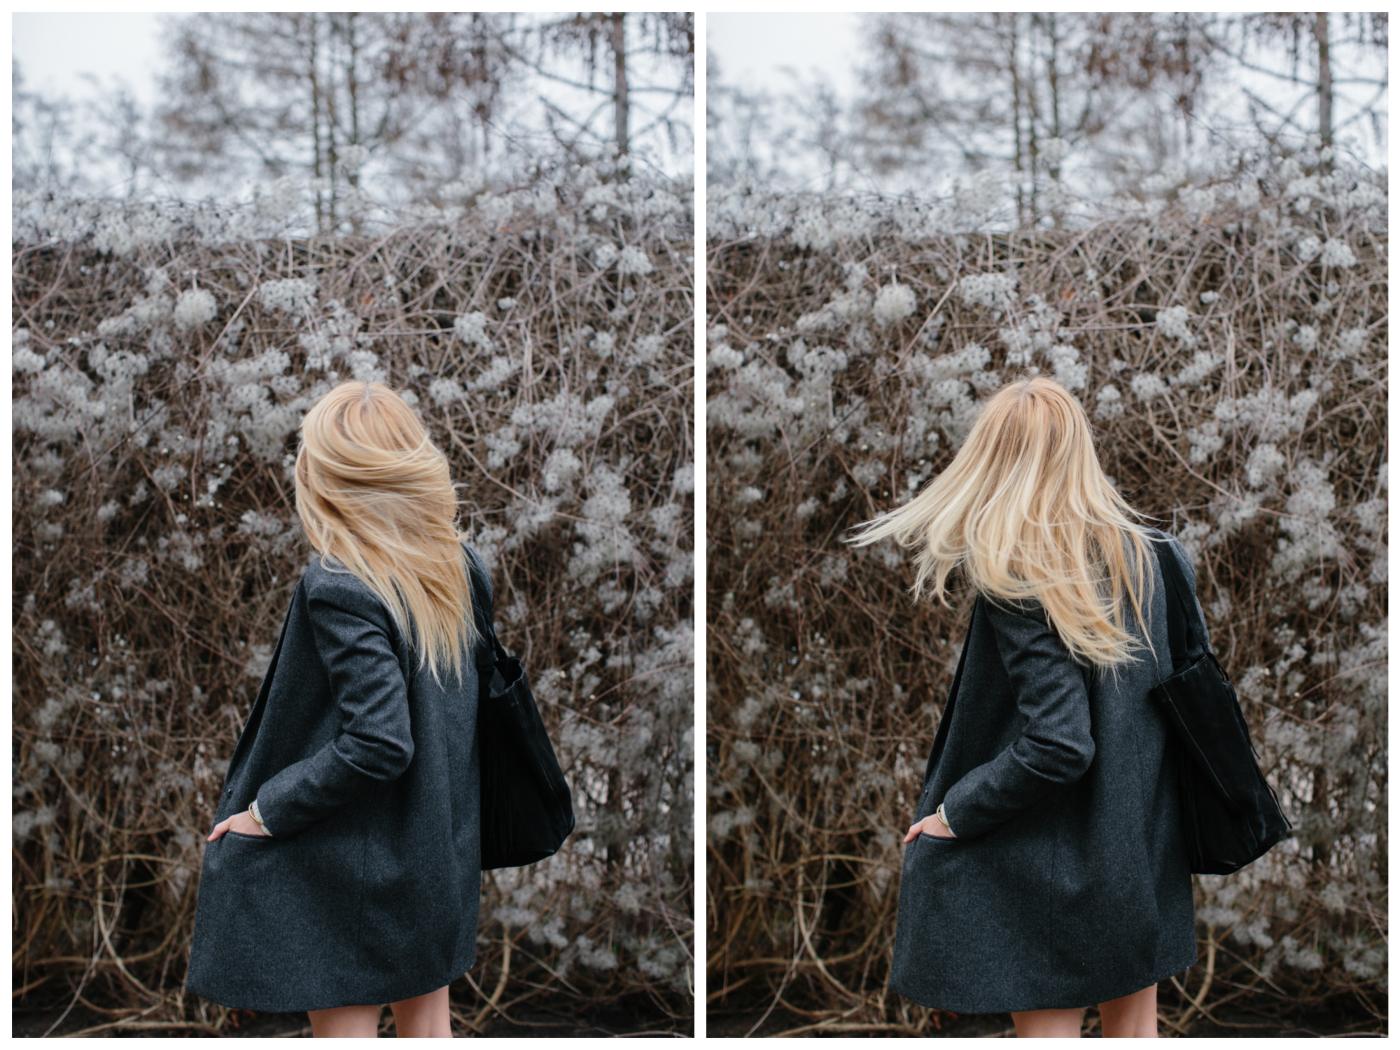 _E1A0617_Fotor_Collage